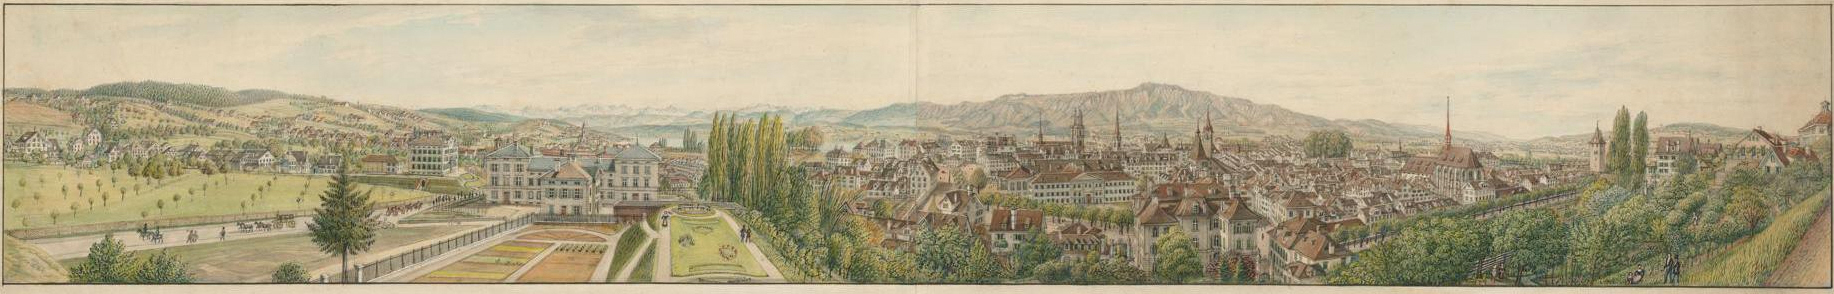 Manuscript panorama of the city of Zurich viewed from Schönberggasse, c. 1844